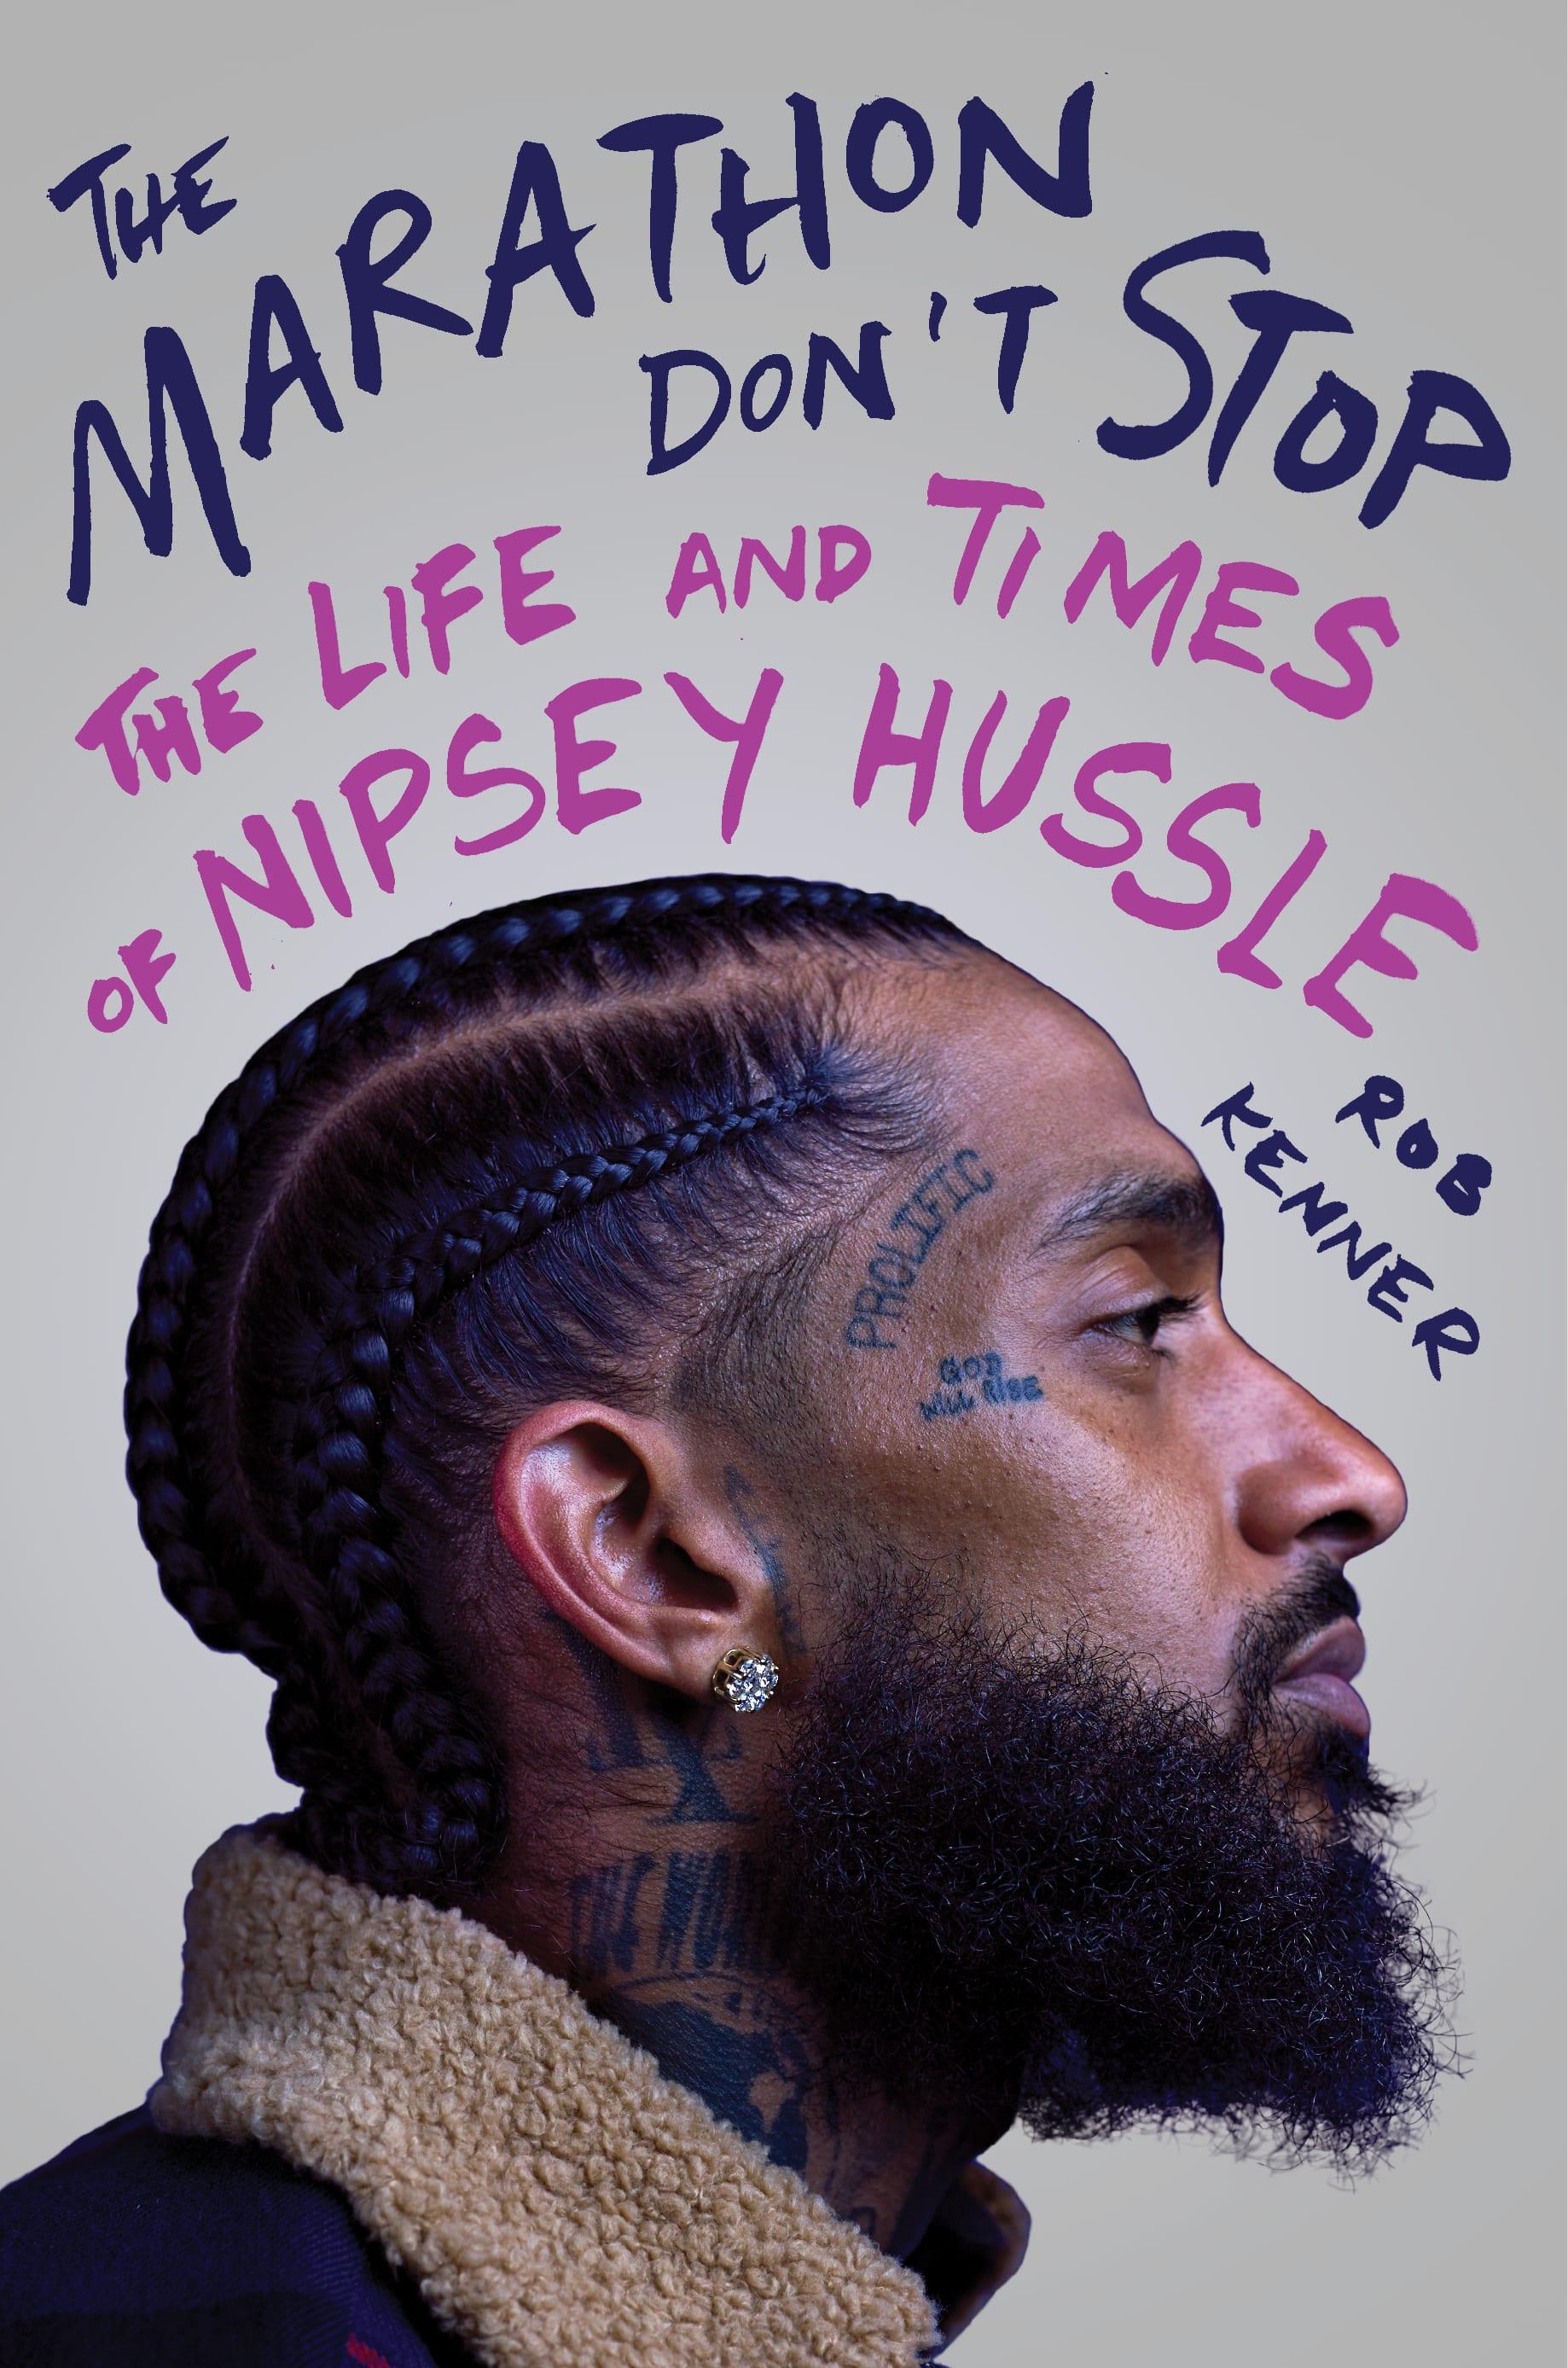 'The Marathon Don't Stop' Nipsey Hussle biography